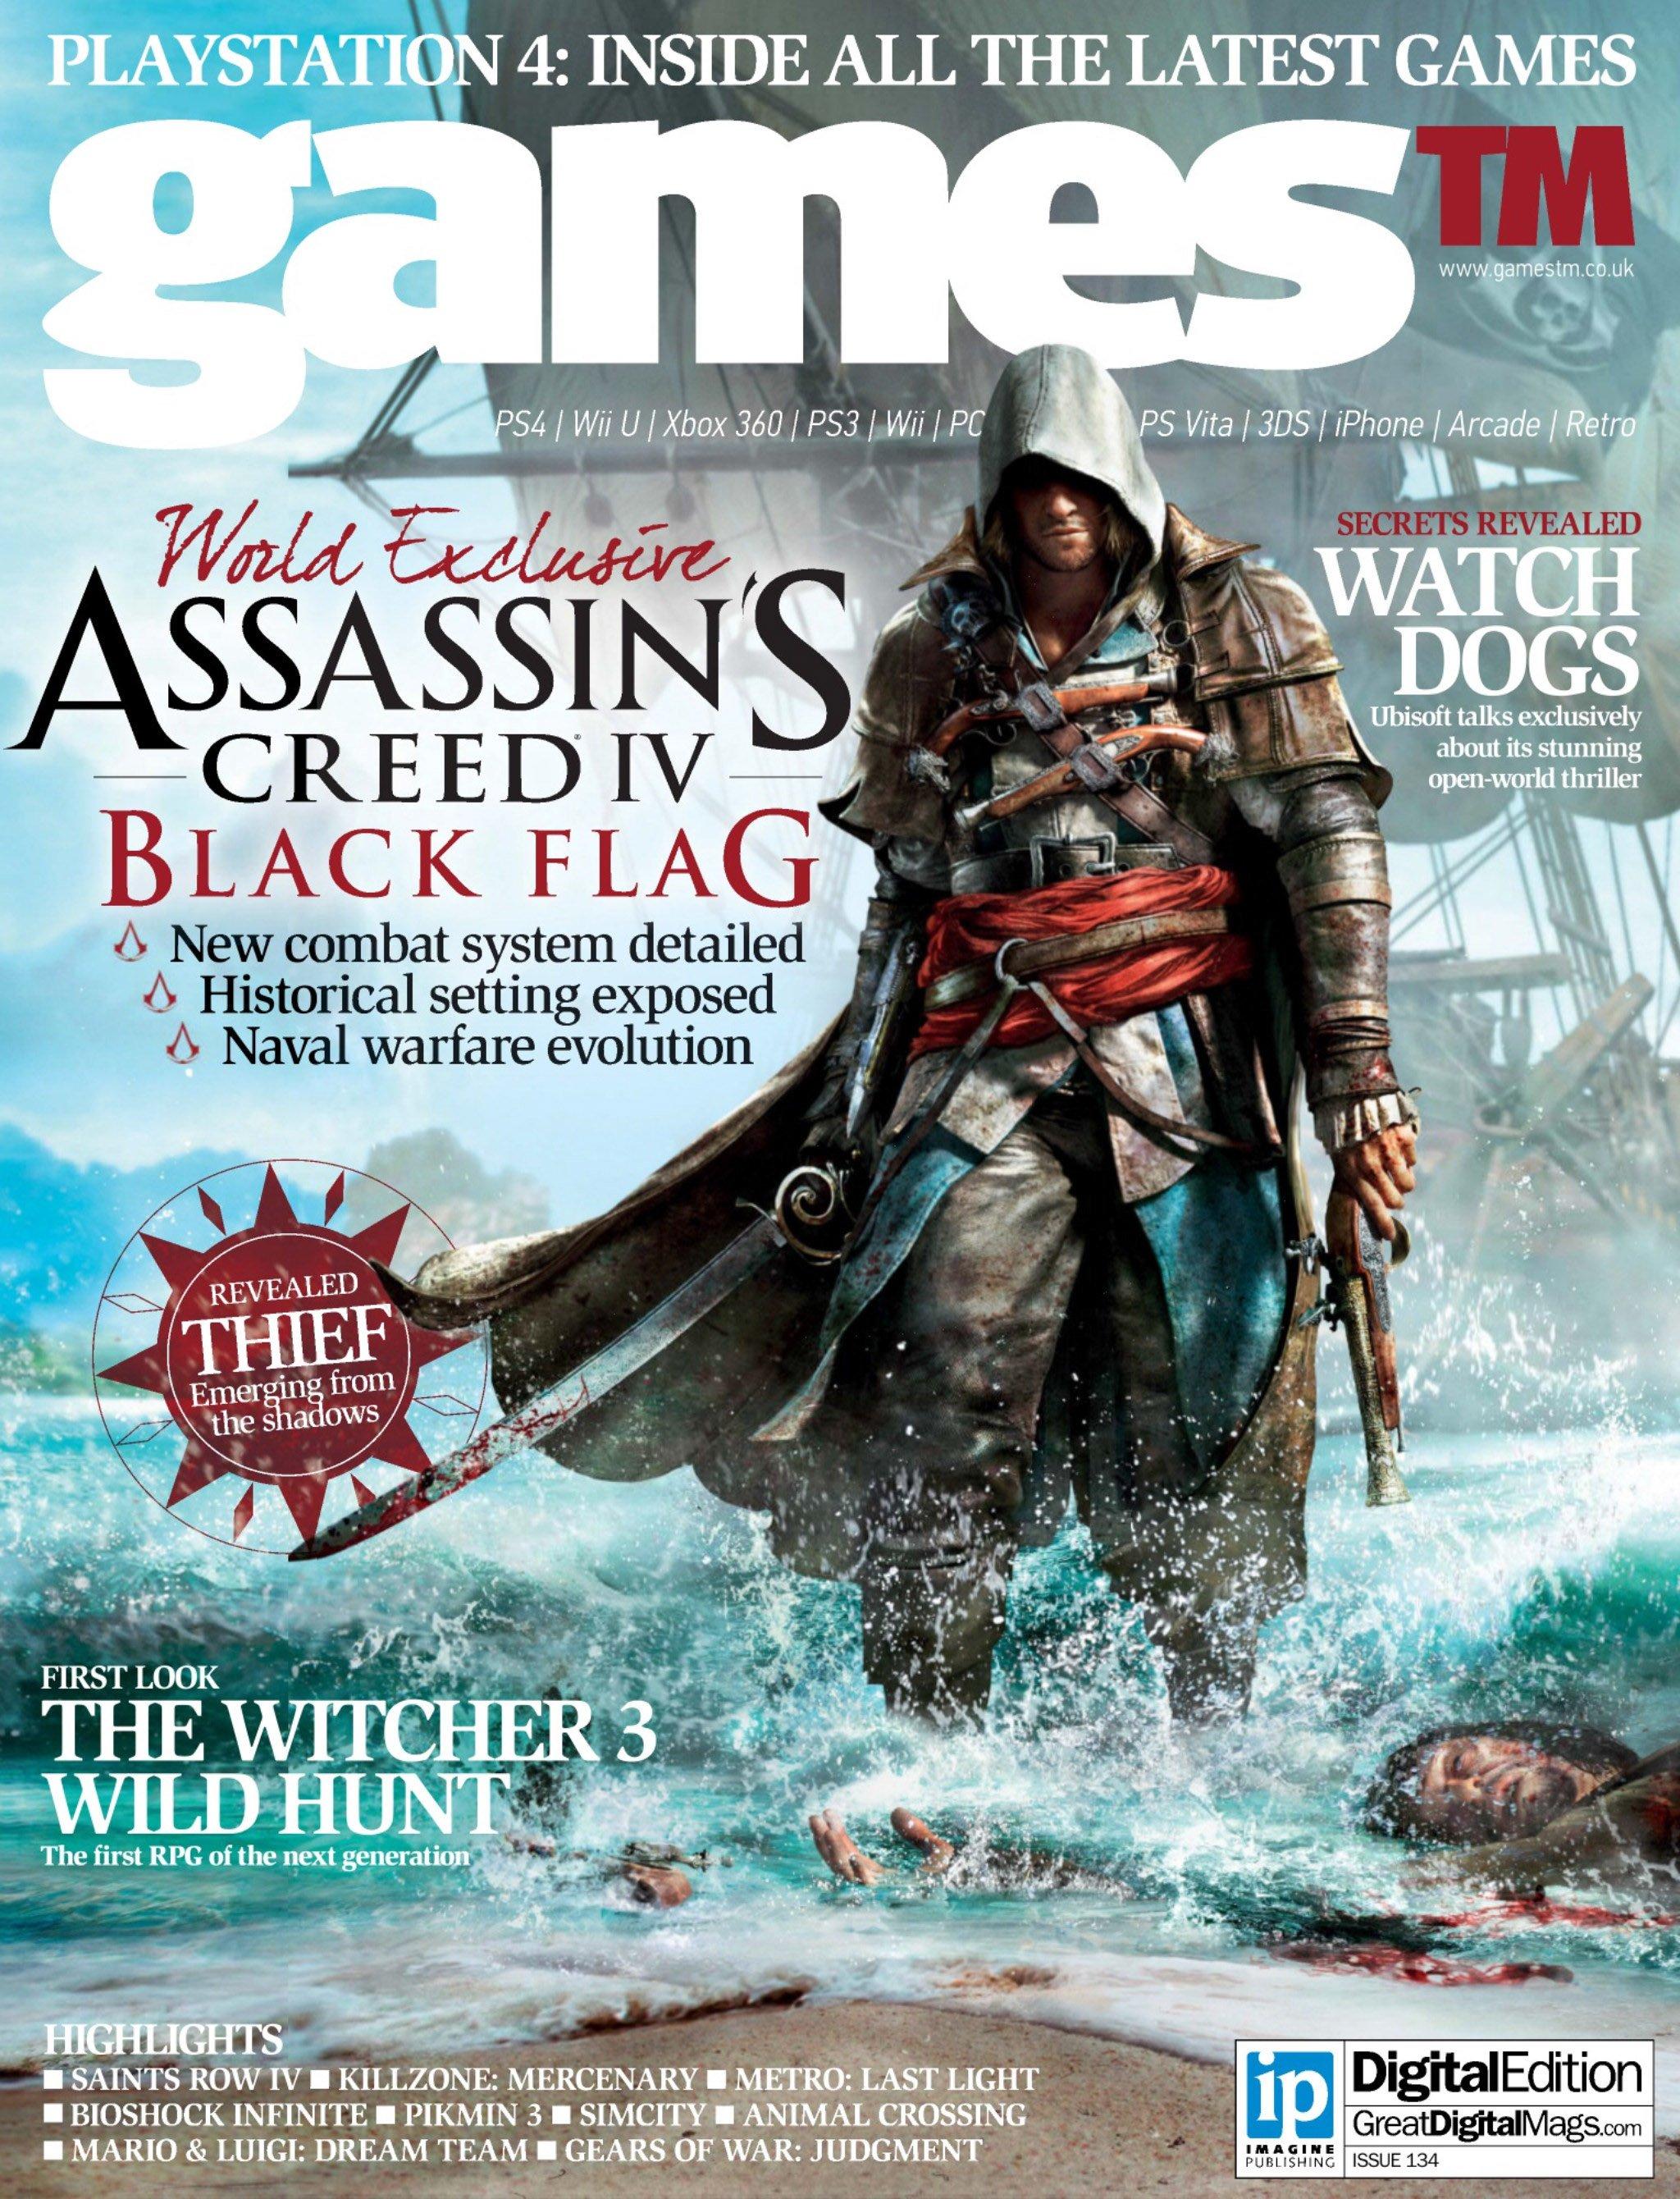 Games TM Issue 134 (April 2013)